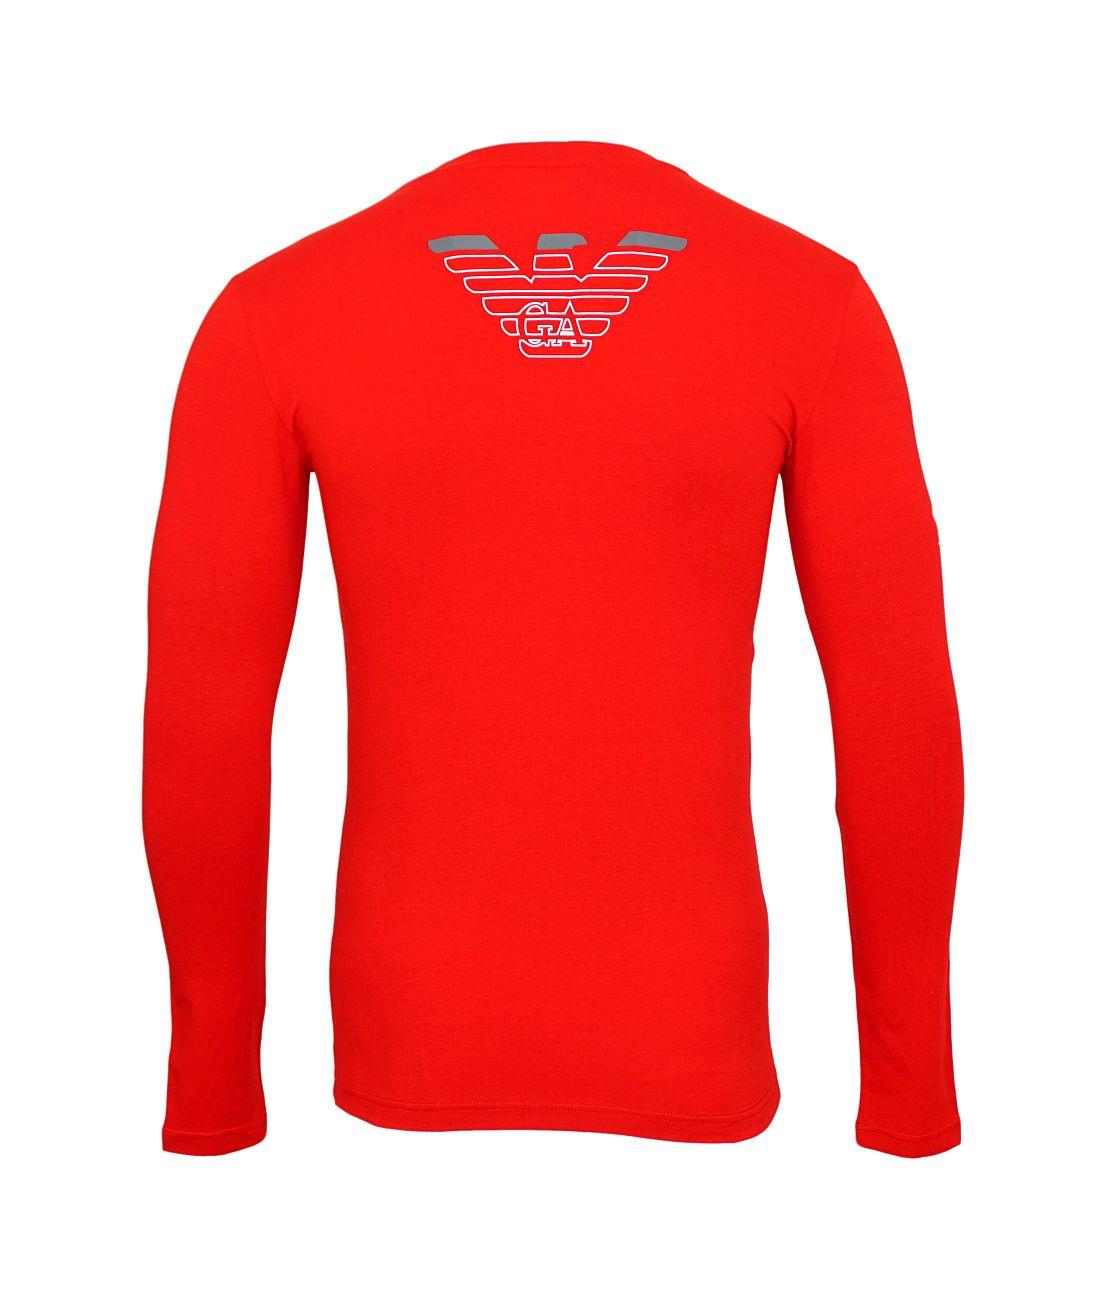 Emporio Armani Longsleeve Rundhals Shirt 111023 8A725 13174 RUBINO WX18-EAL